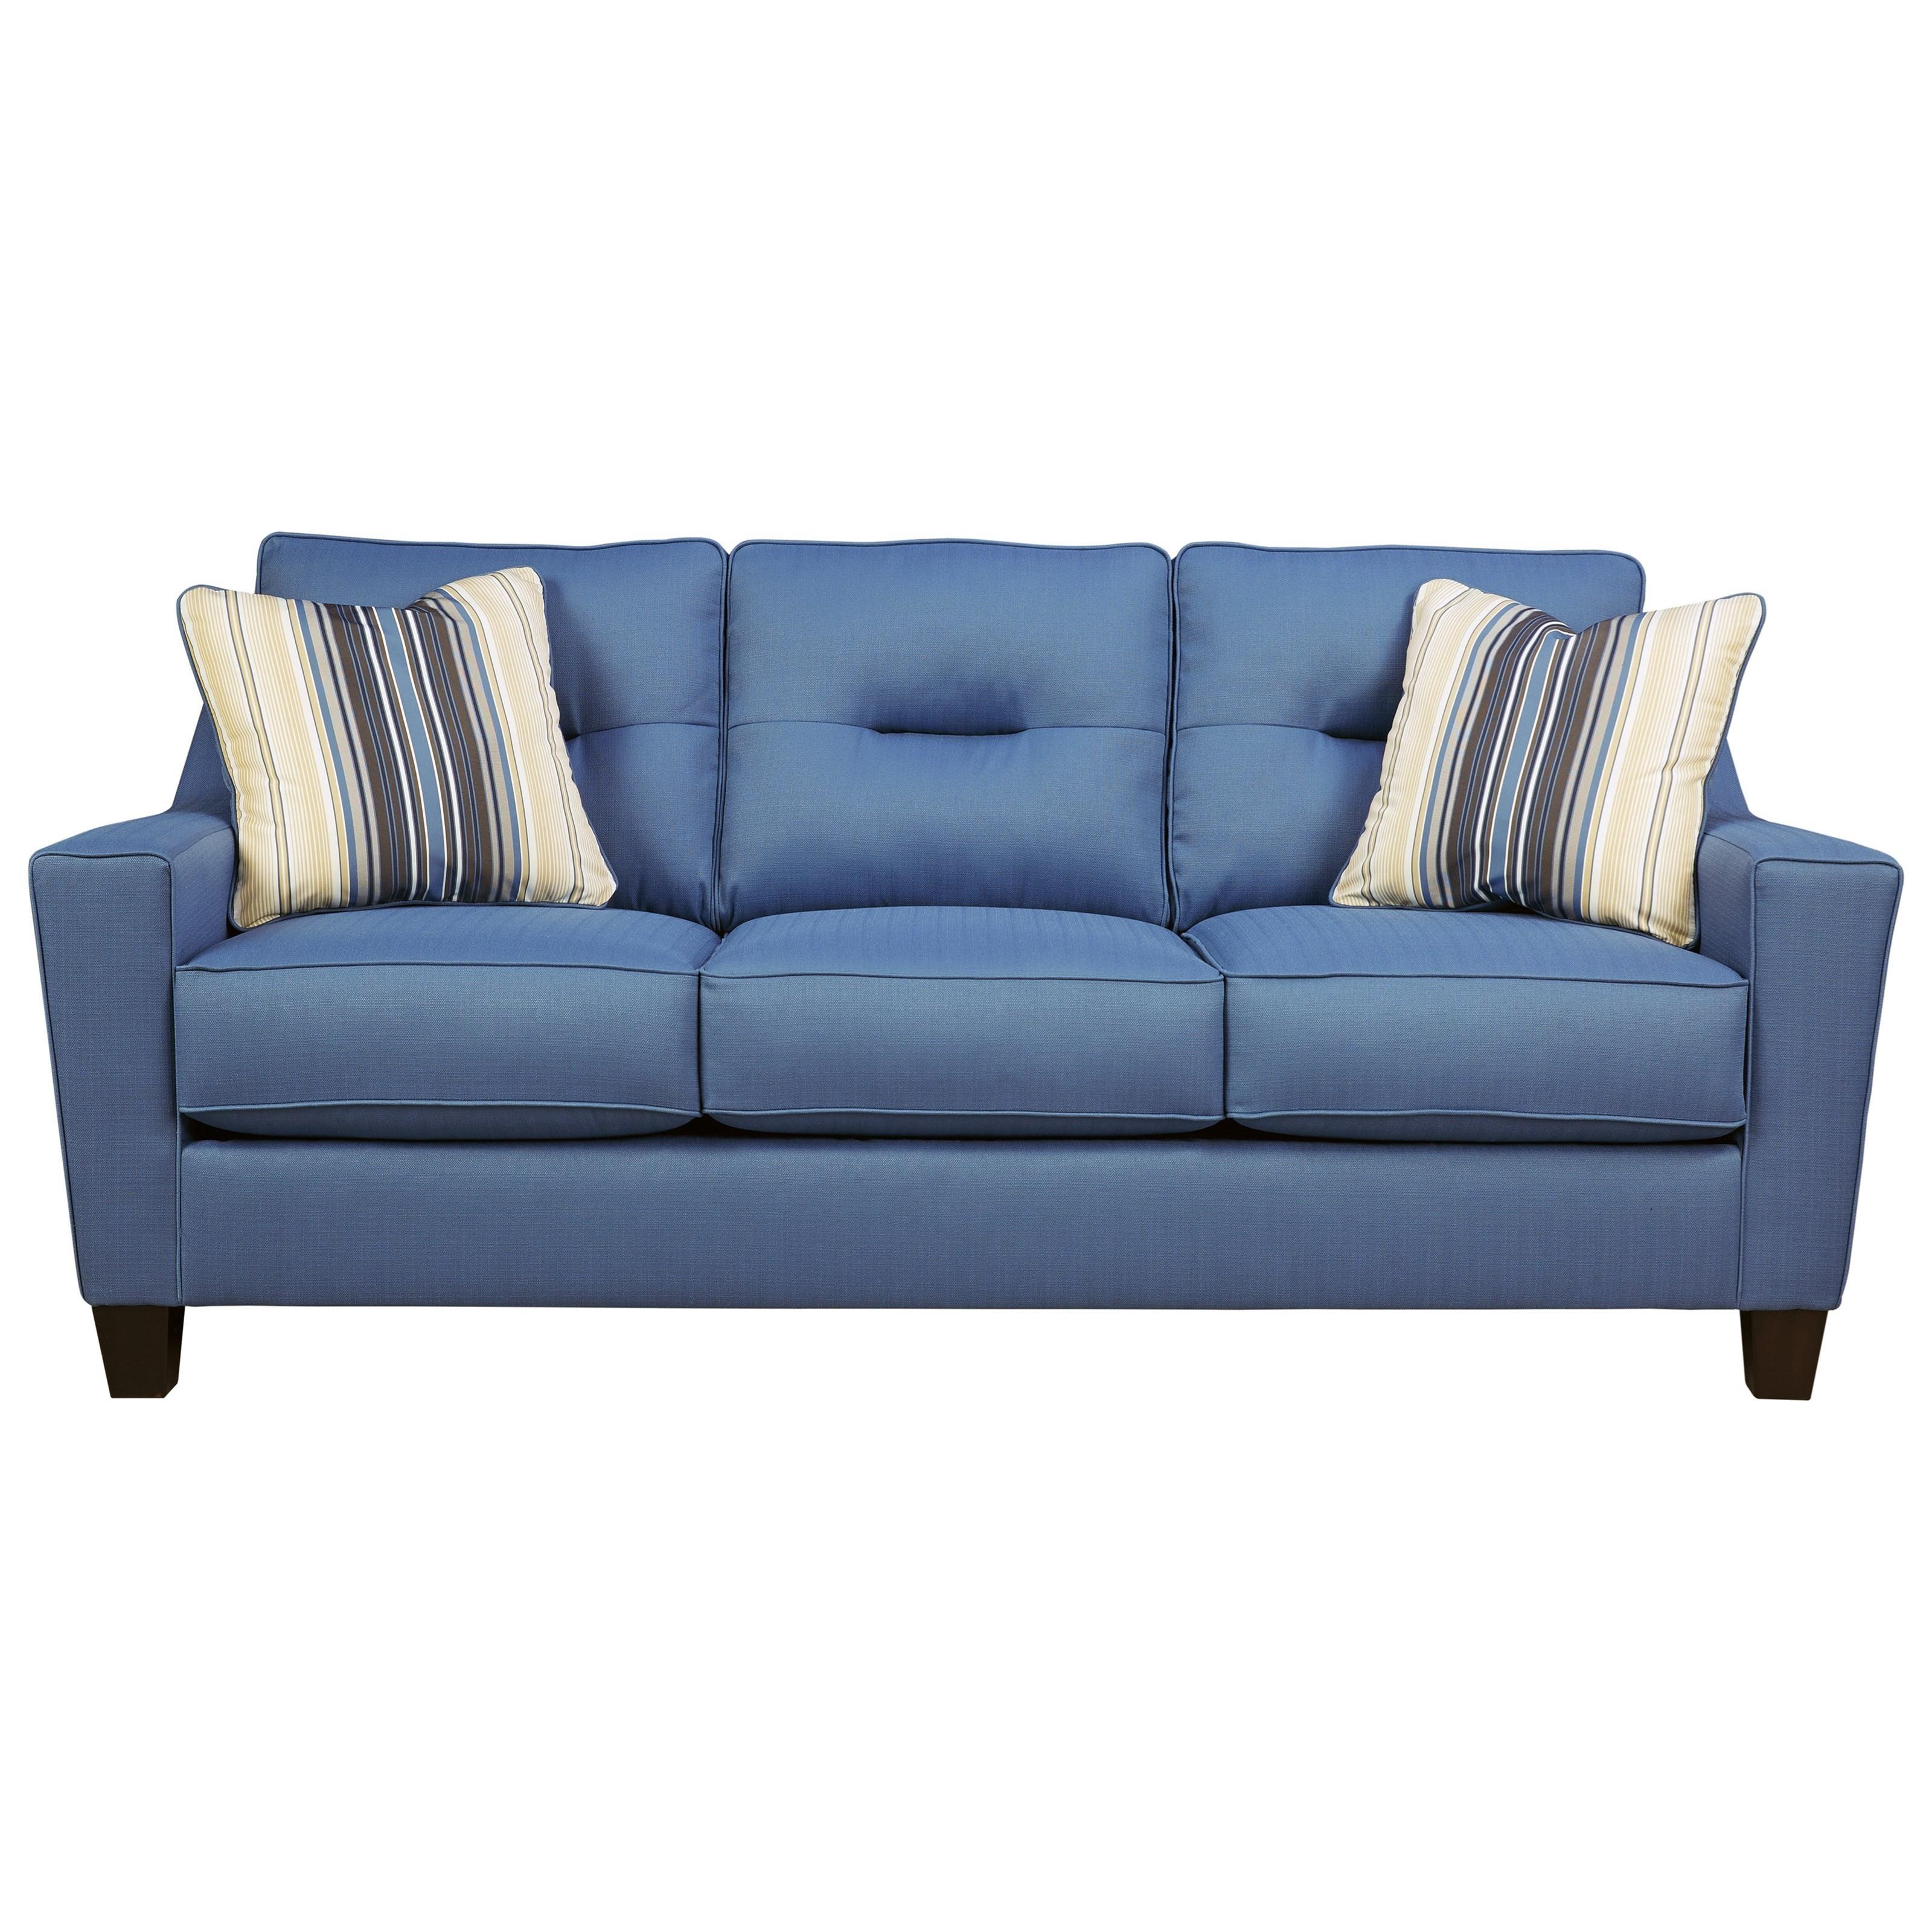 Benchcraft Forsan Nuvella Contemporary Sofa In Performance Fabric   Dunk U0026  Bright Furniture   Sofas